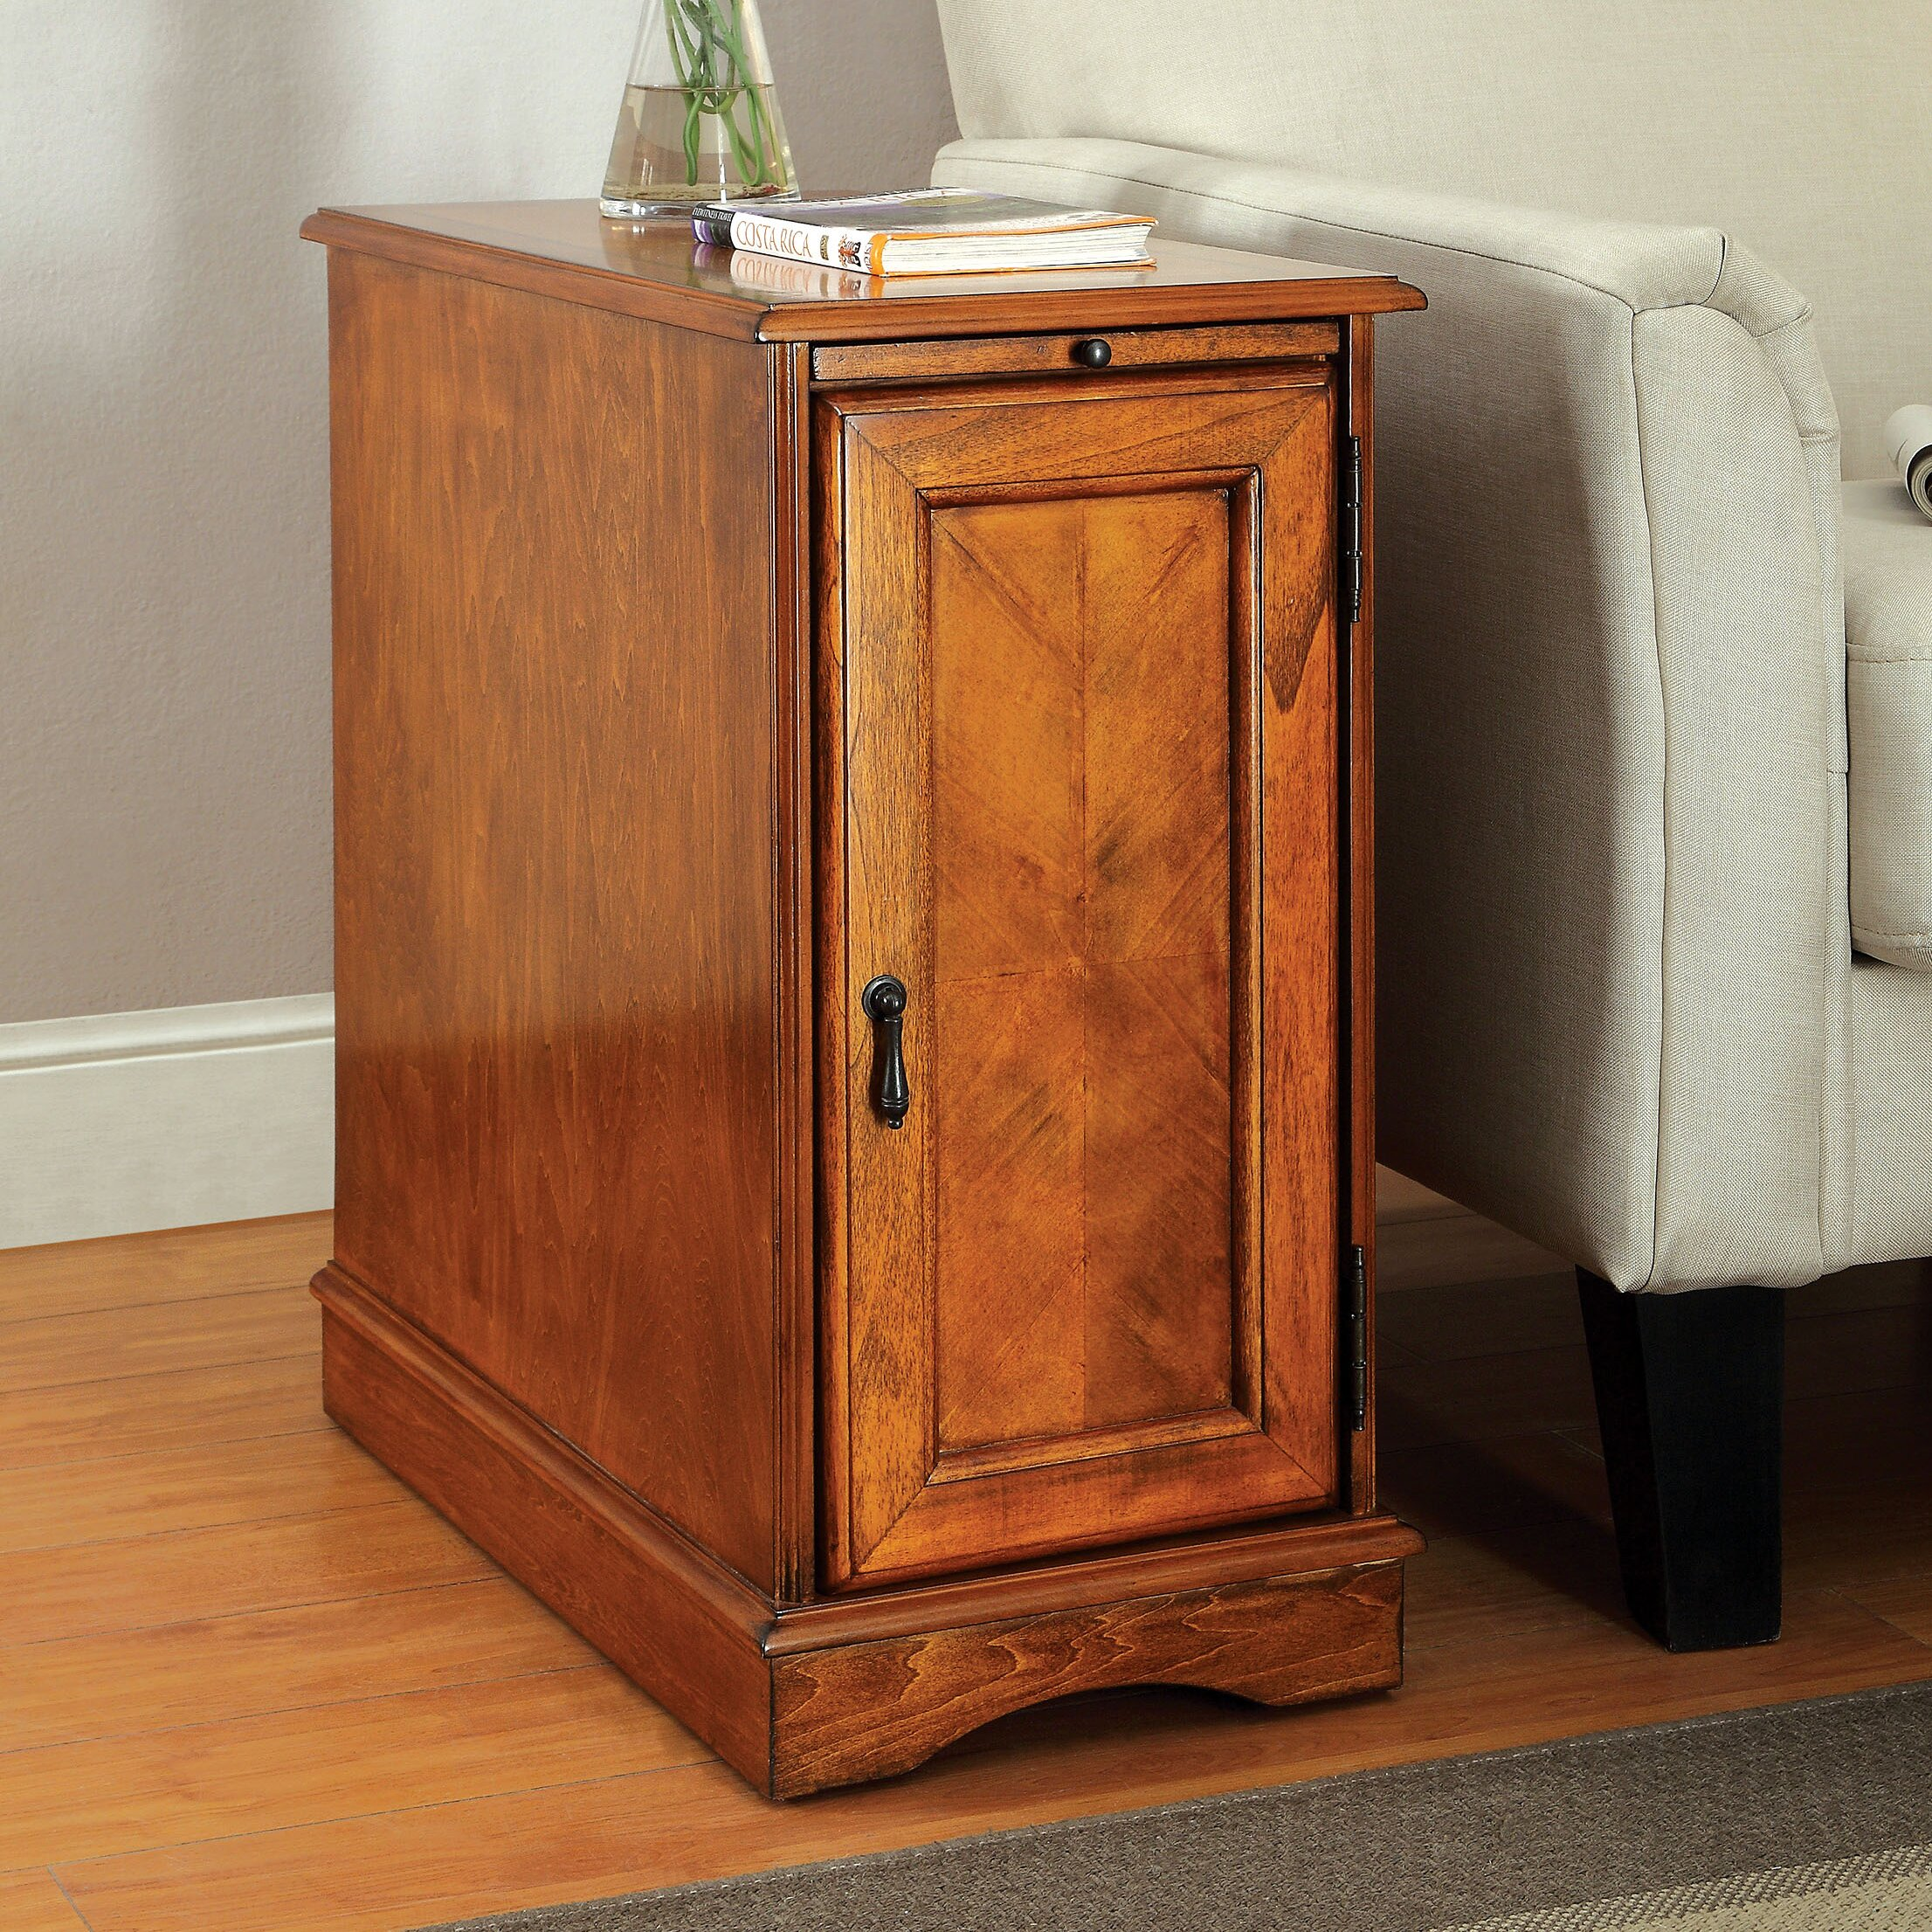 three posts sweden end table reviews wayfair. Black Bedroom Furniture Sets. Home Design Ideas